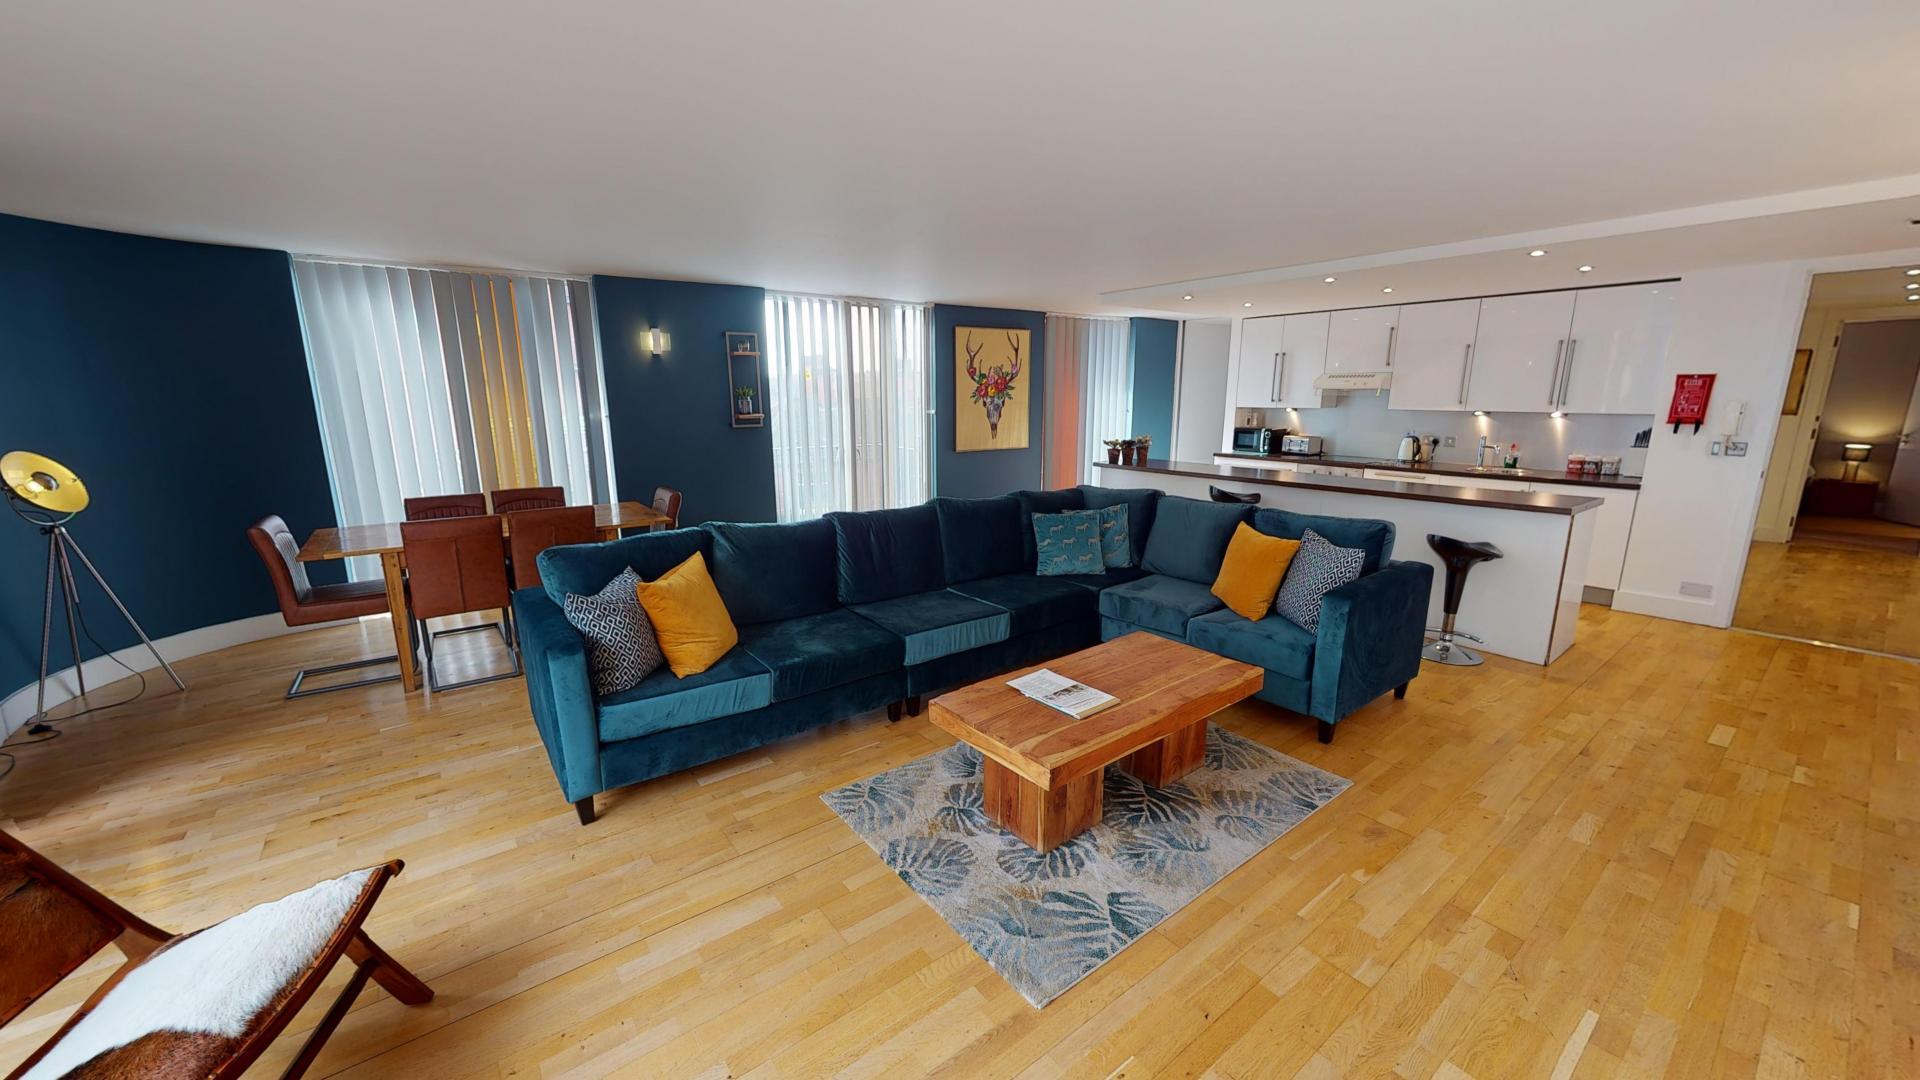 Velvet sofa at Sinclair Apartments, Centre, Sheffield - Citybase Apartments